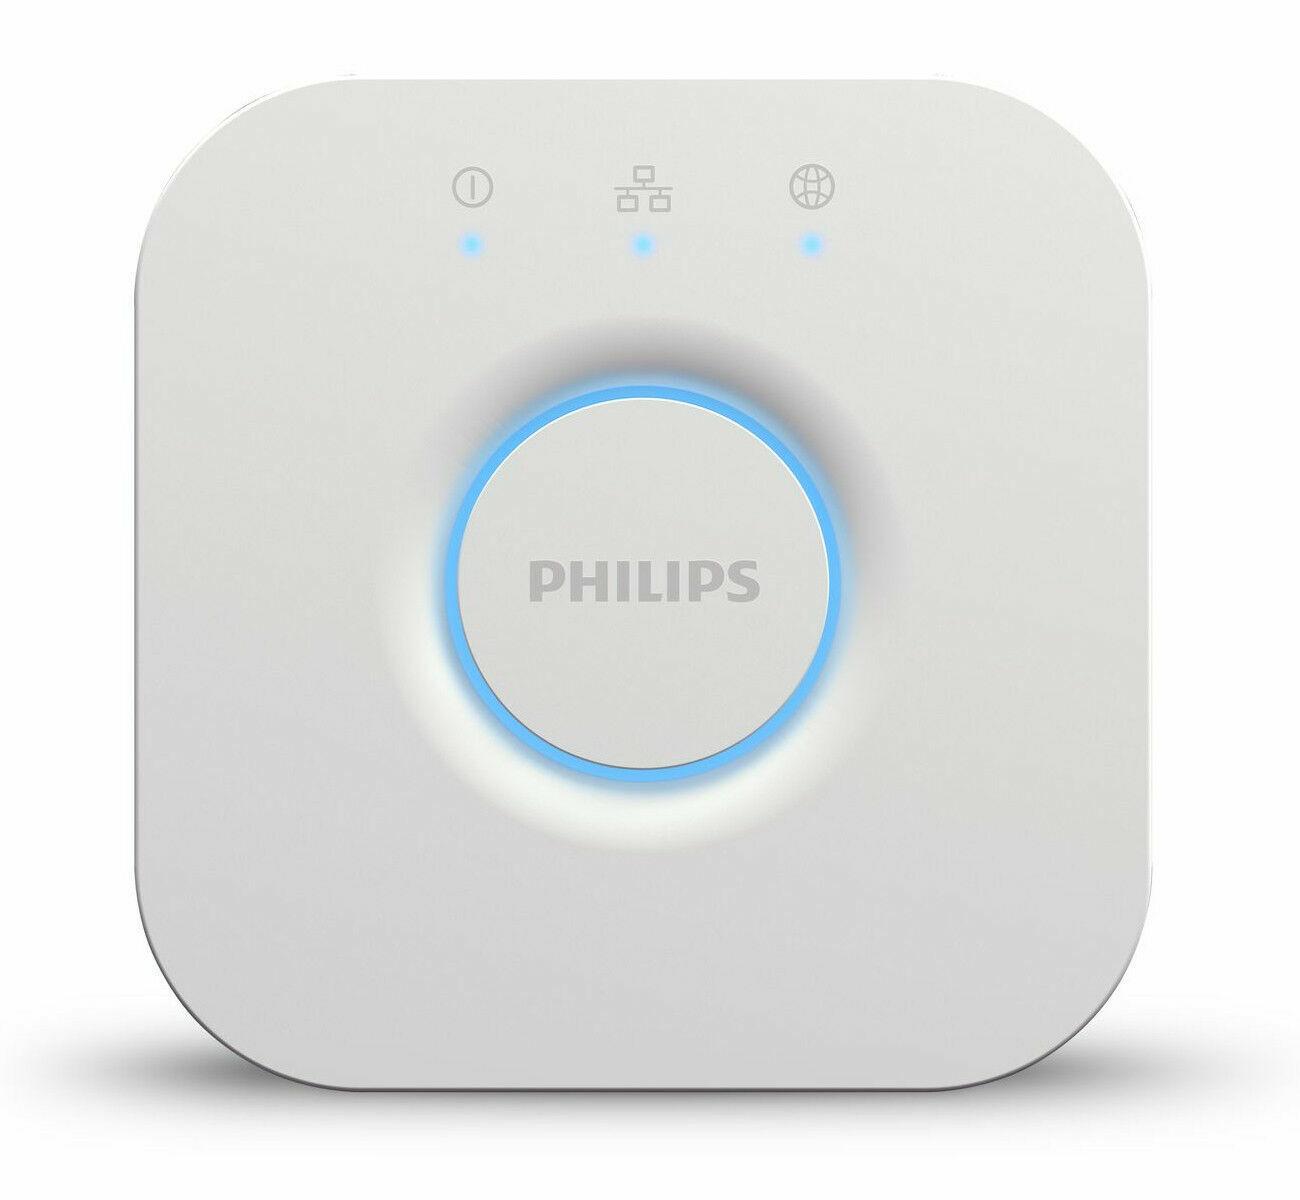 458471 Philips Hue Bridge 2nd Generation Home Automation Kit